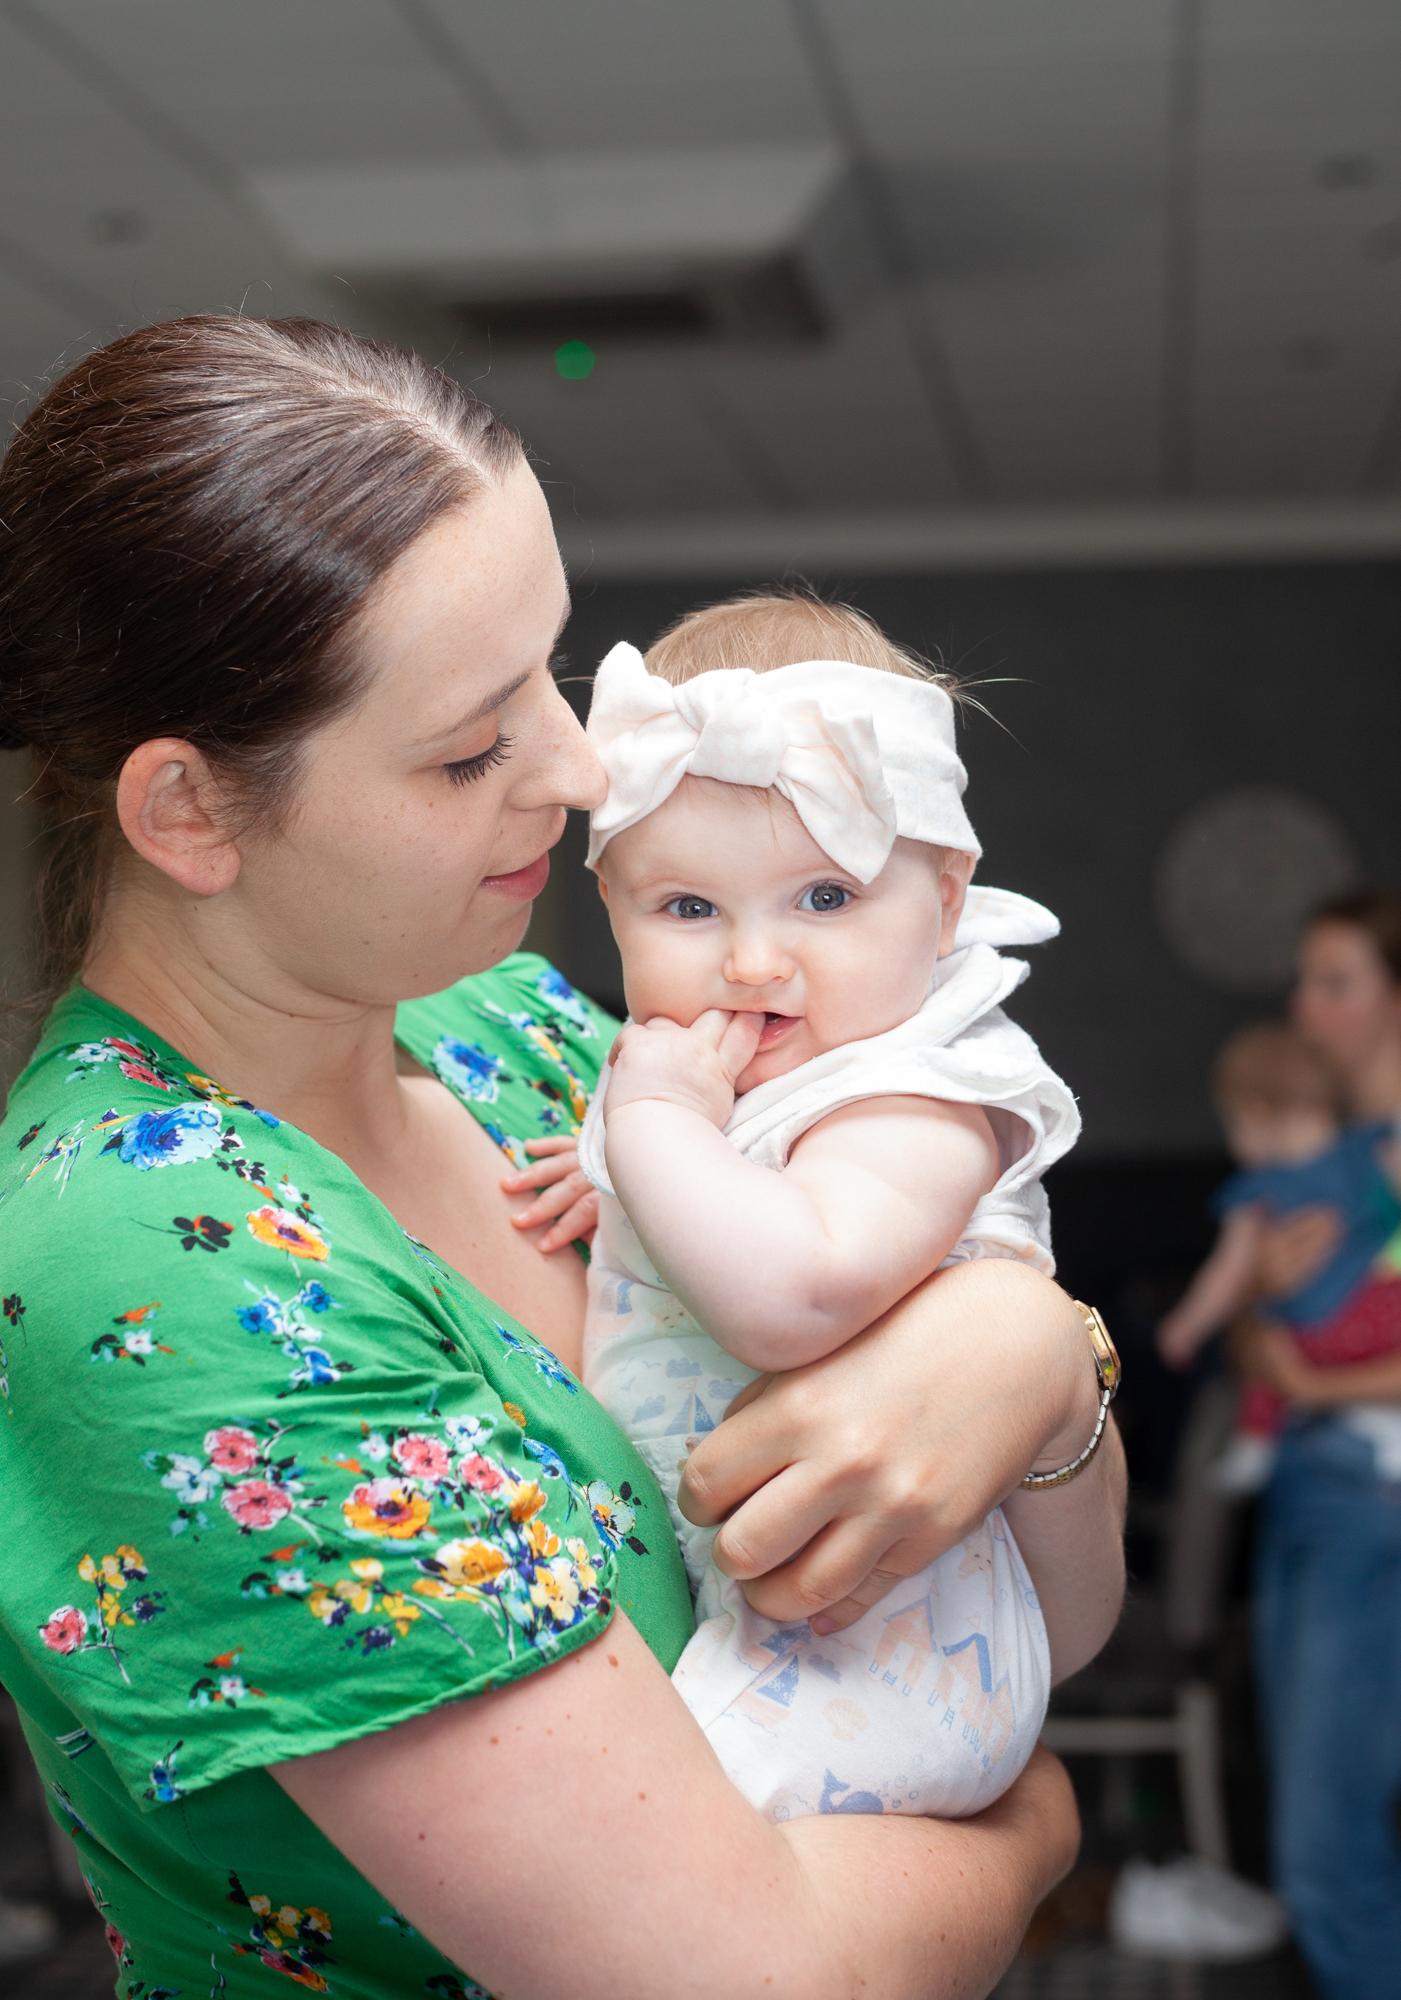 baby-class-photography-photographer-manchester-cheshire-4.jpg